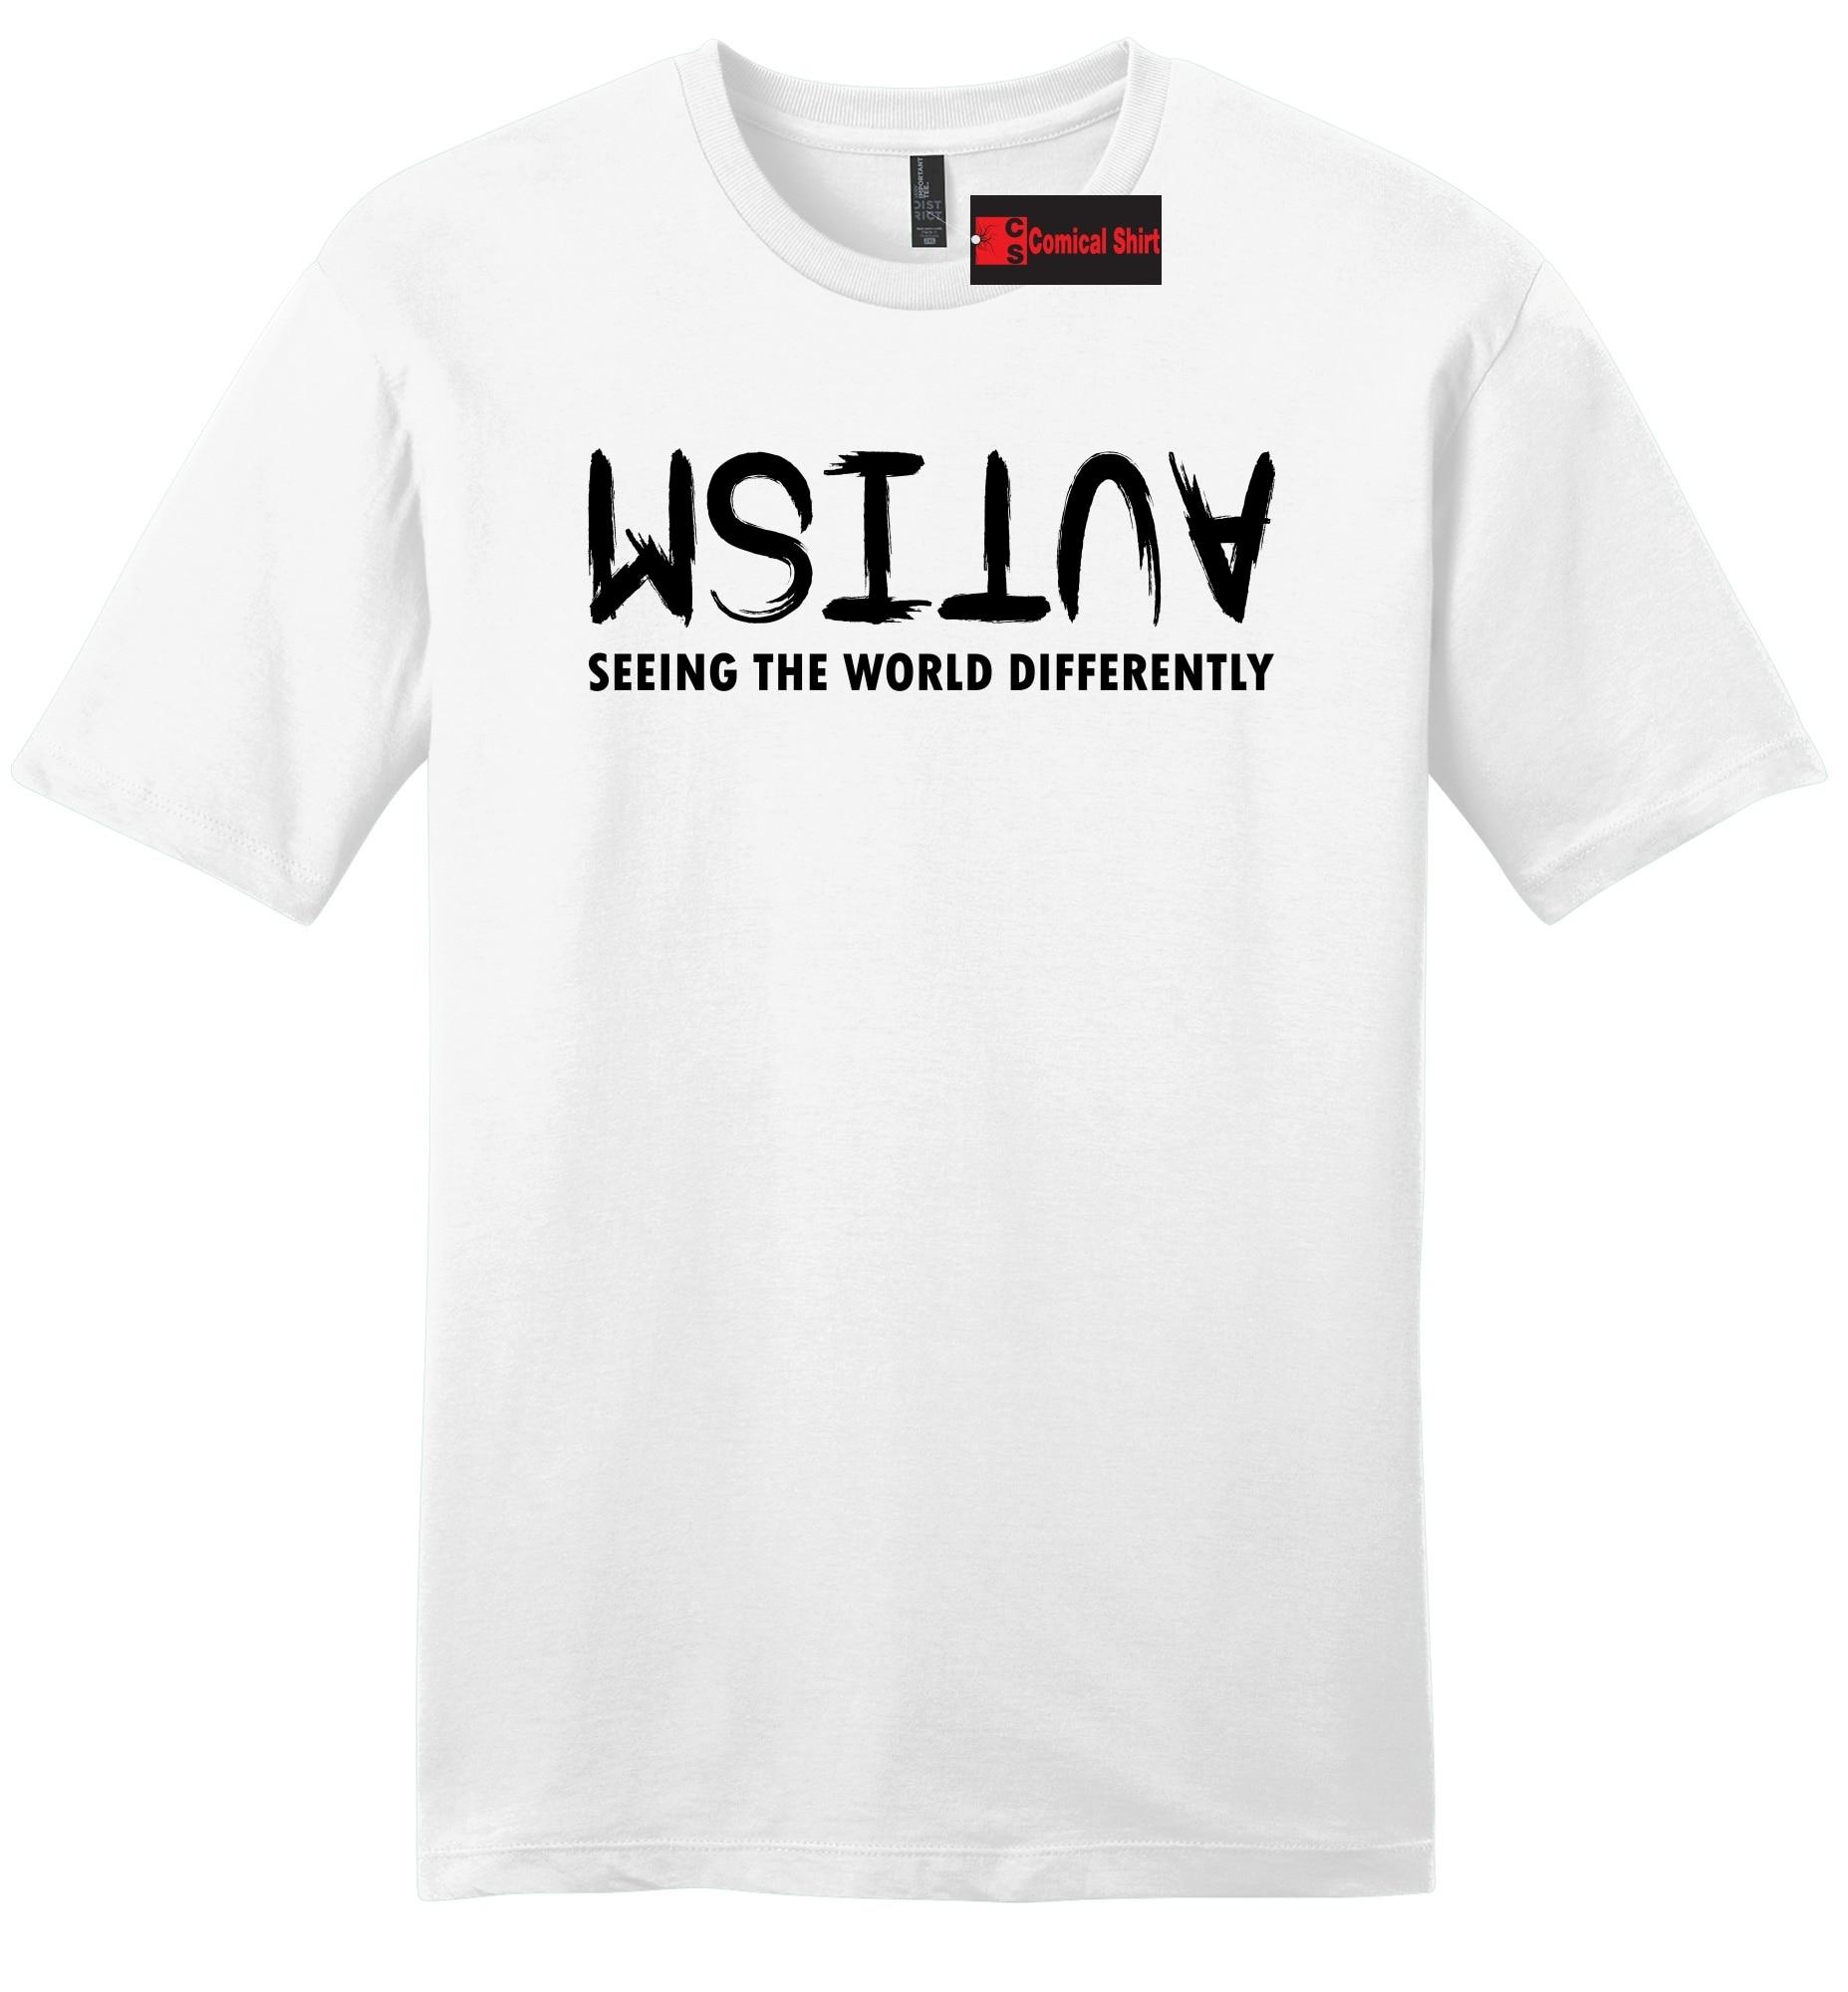 dbd492122e2 Cheap Autism Awareness T Shirts | Toffee Art